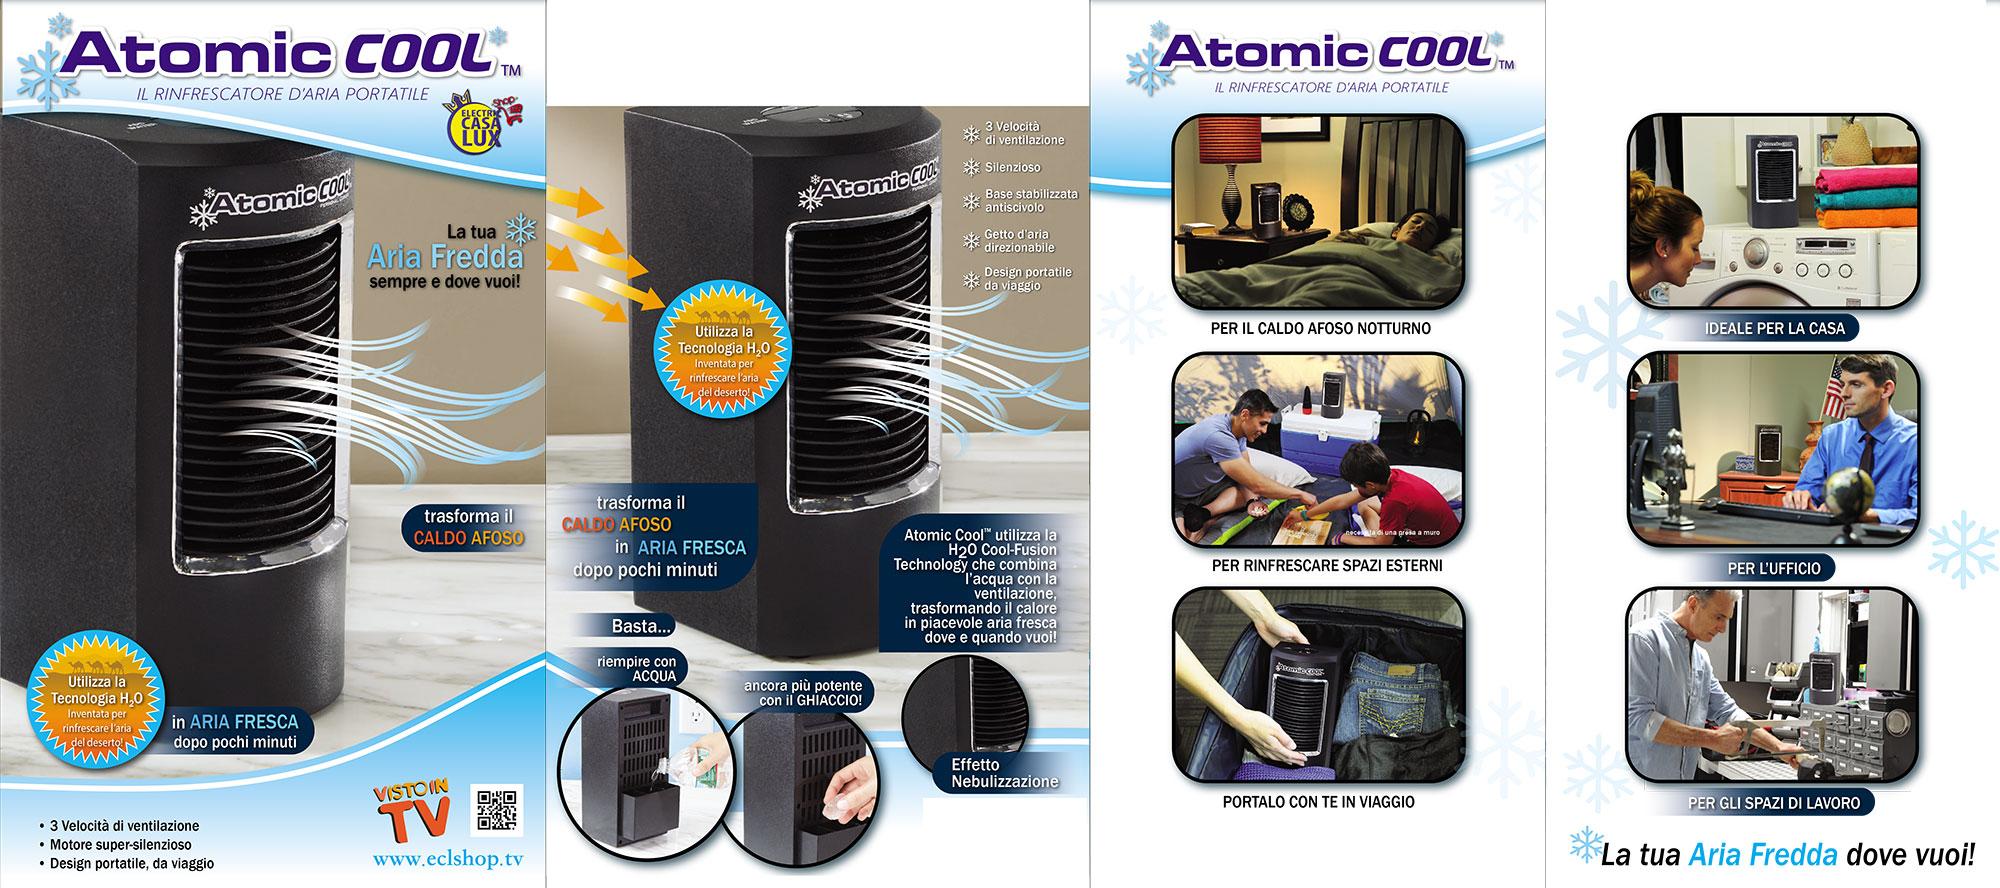 Atomic Cool Il Rinfrescatore D'Aria Portatile